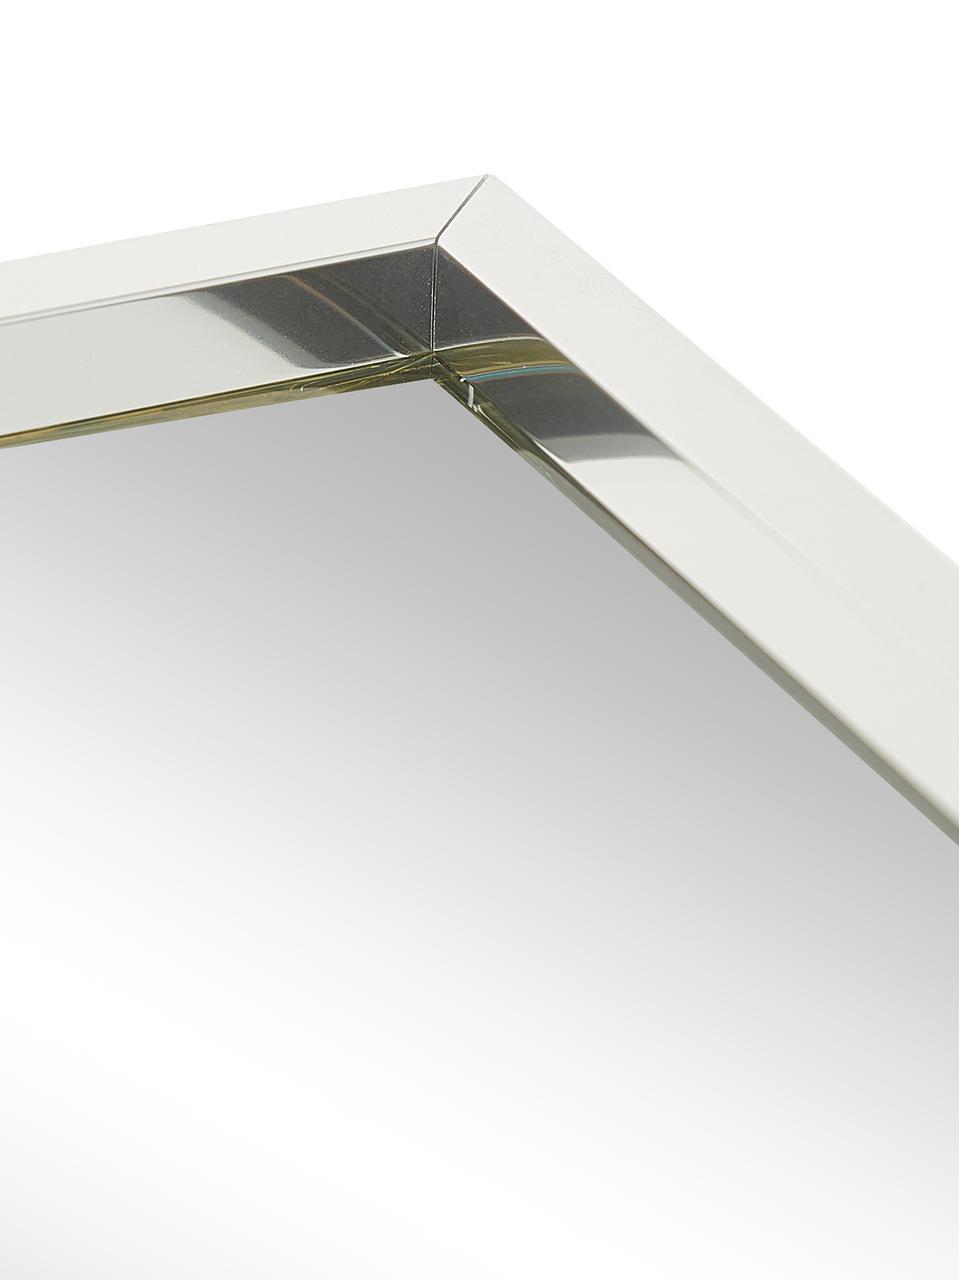 miroir mural rectangulaire avec cadre argente alpha